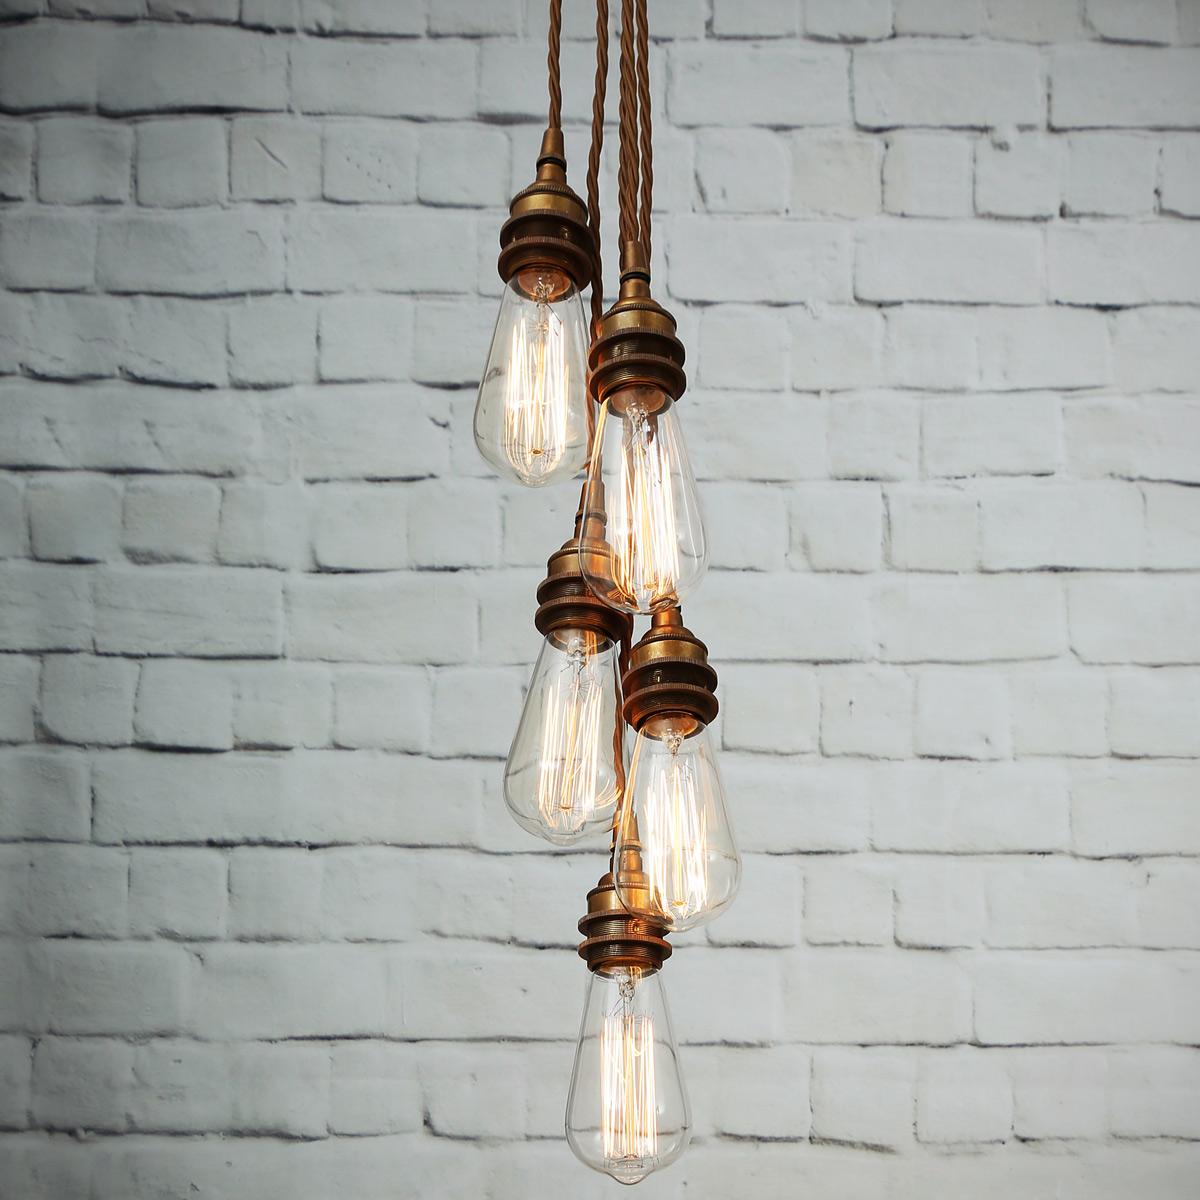 Einfache lampe good fackelart wandlampe moderne einfache gangeingang with einfache lampe - Wandlampe holz basteln ...